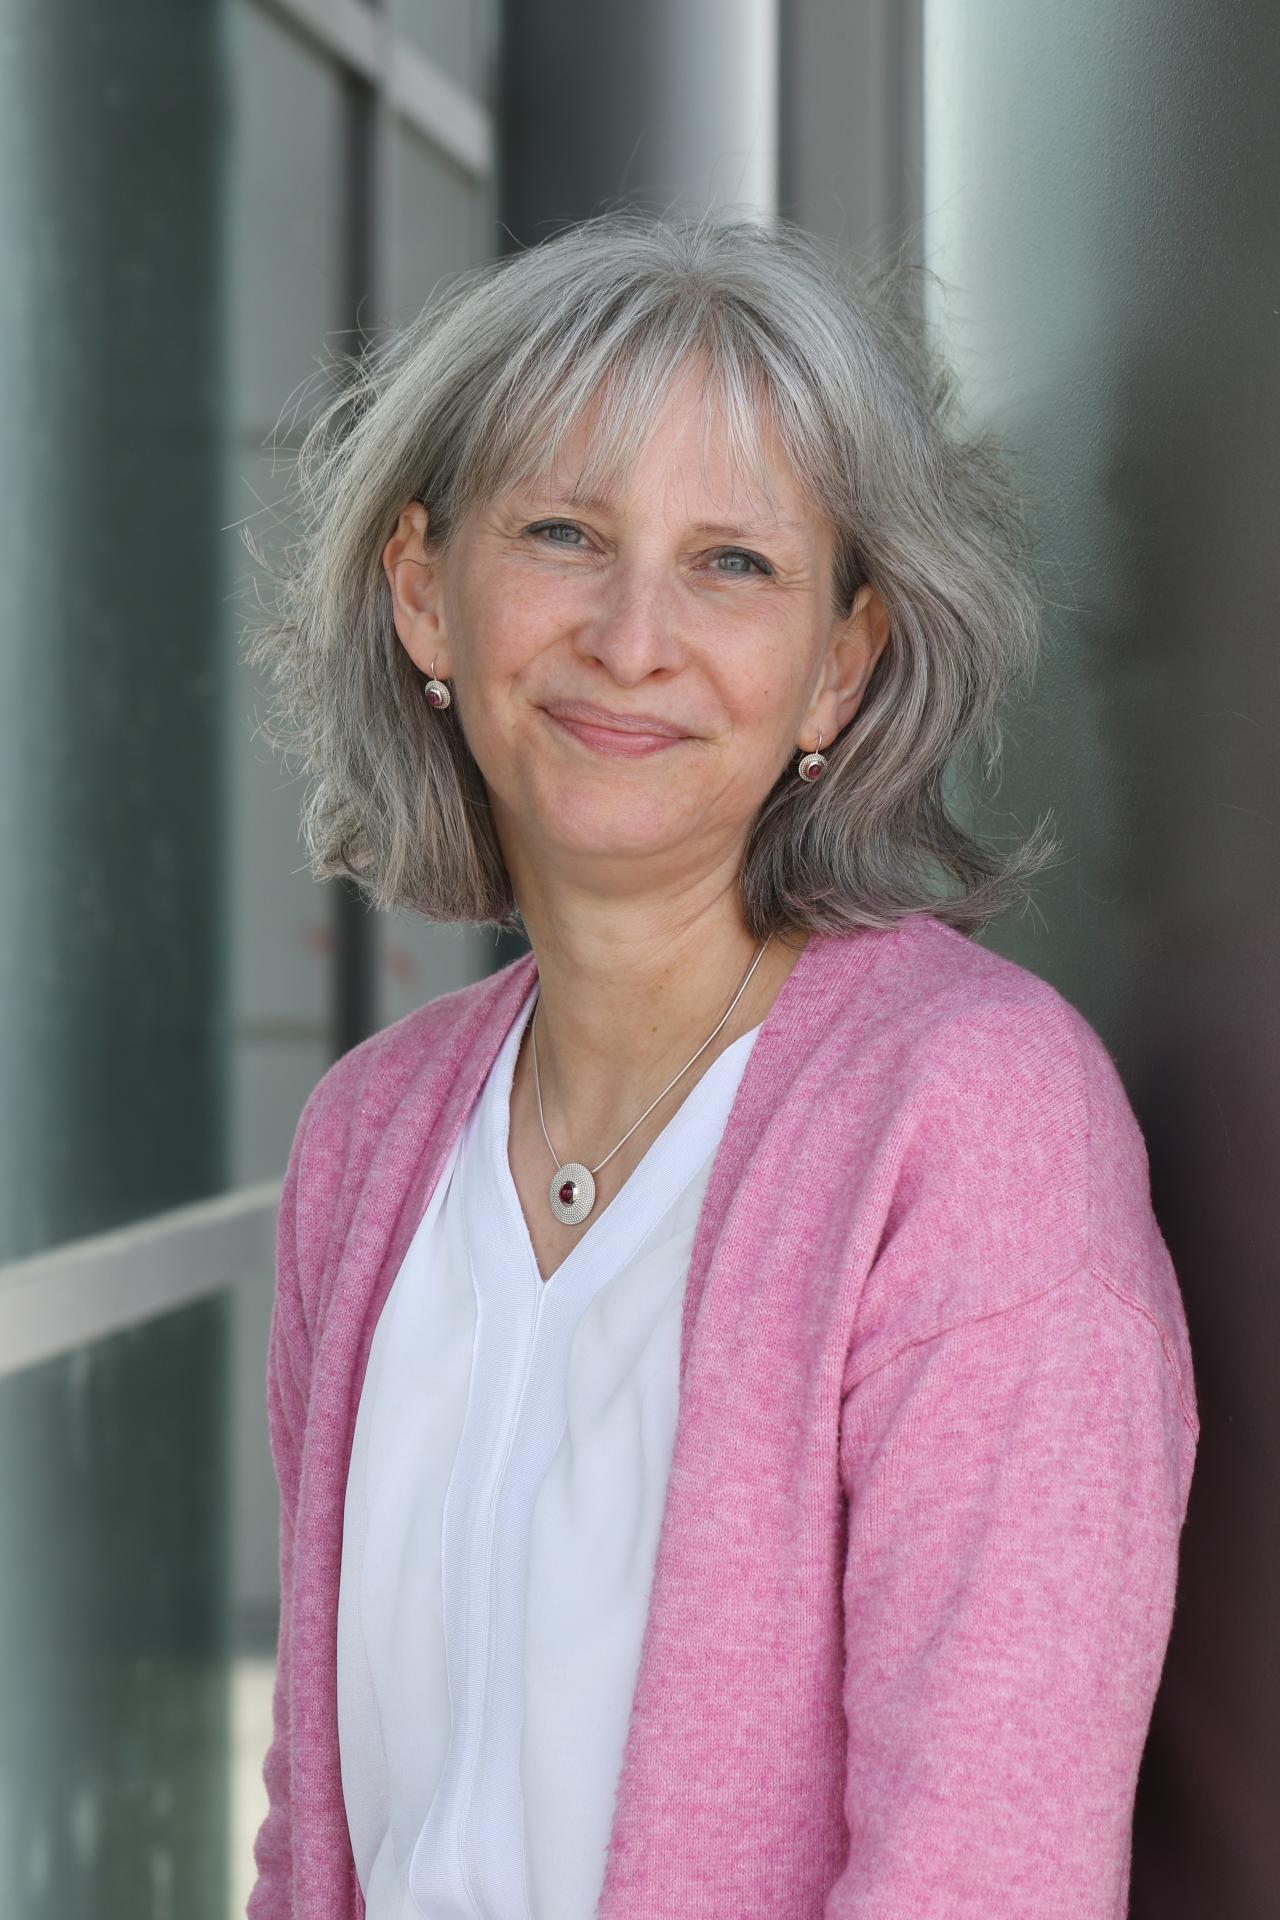 Marianne Feld